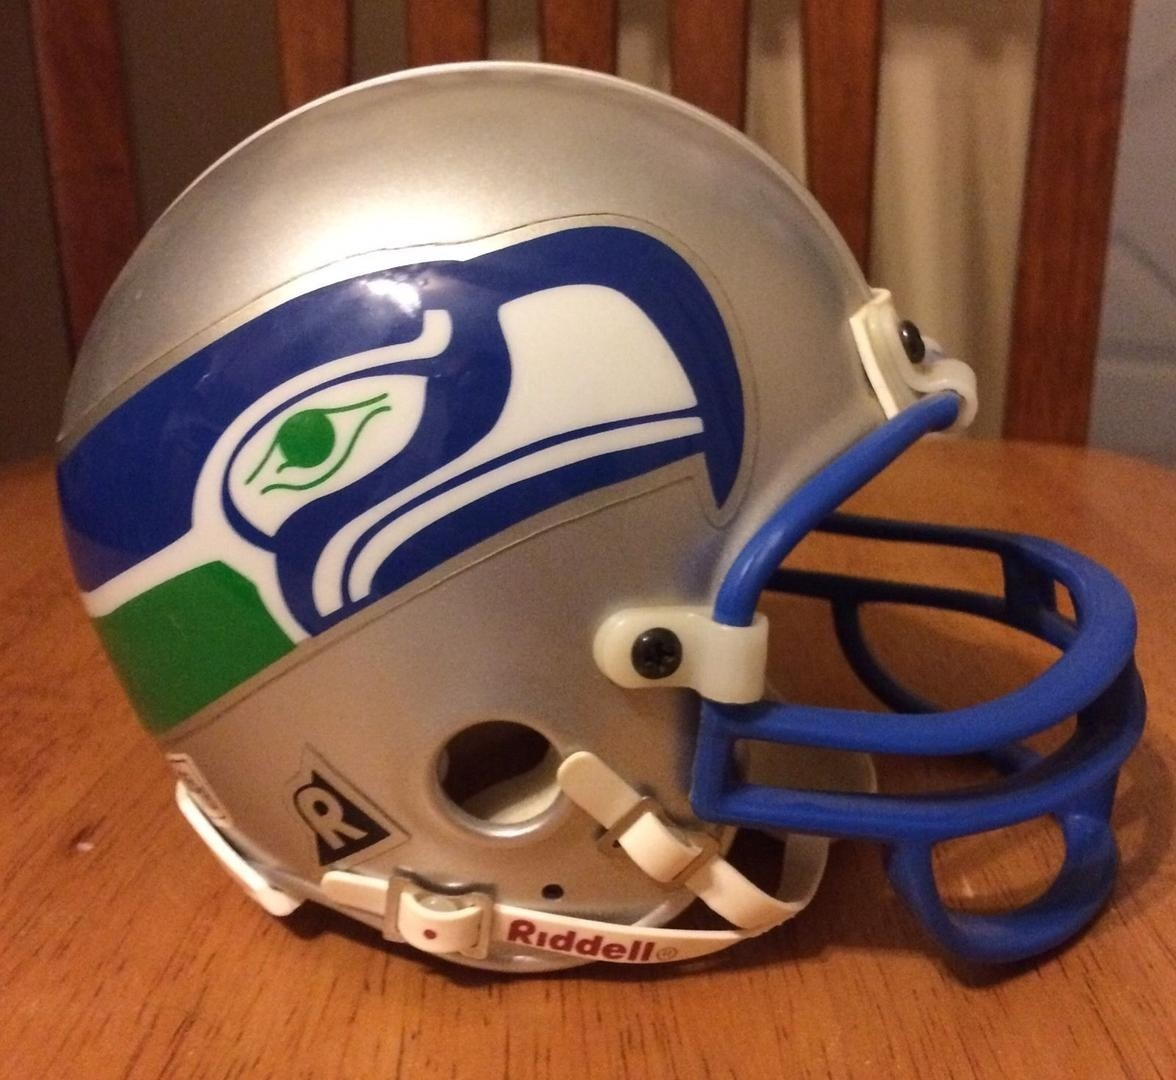 988e182fcc71a mini casco nfl - seattle seahawks - mini helmet riddell. Cargando zoom.